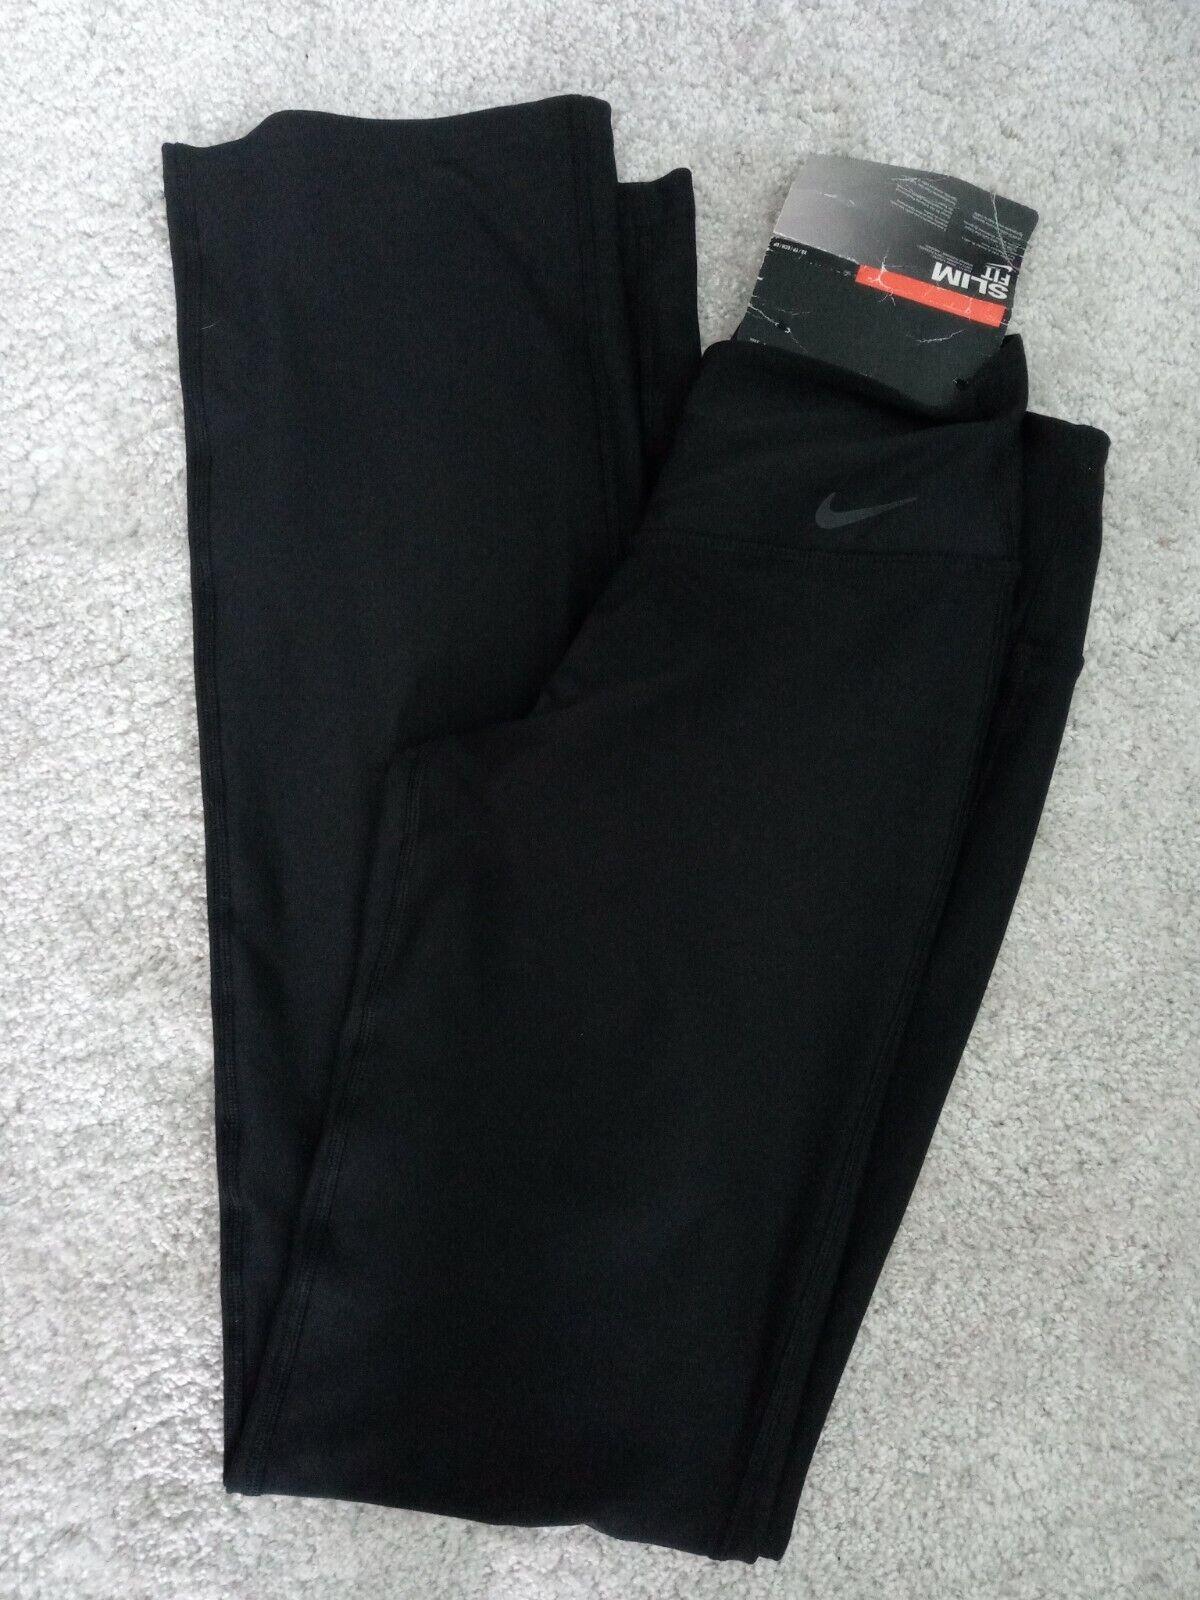 Womens NIKE Dri-Fit Slim Pants/leggings. Black Size XS. NEW With tags